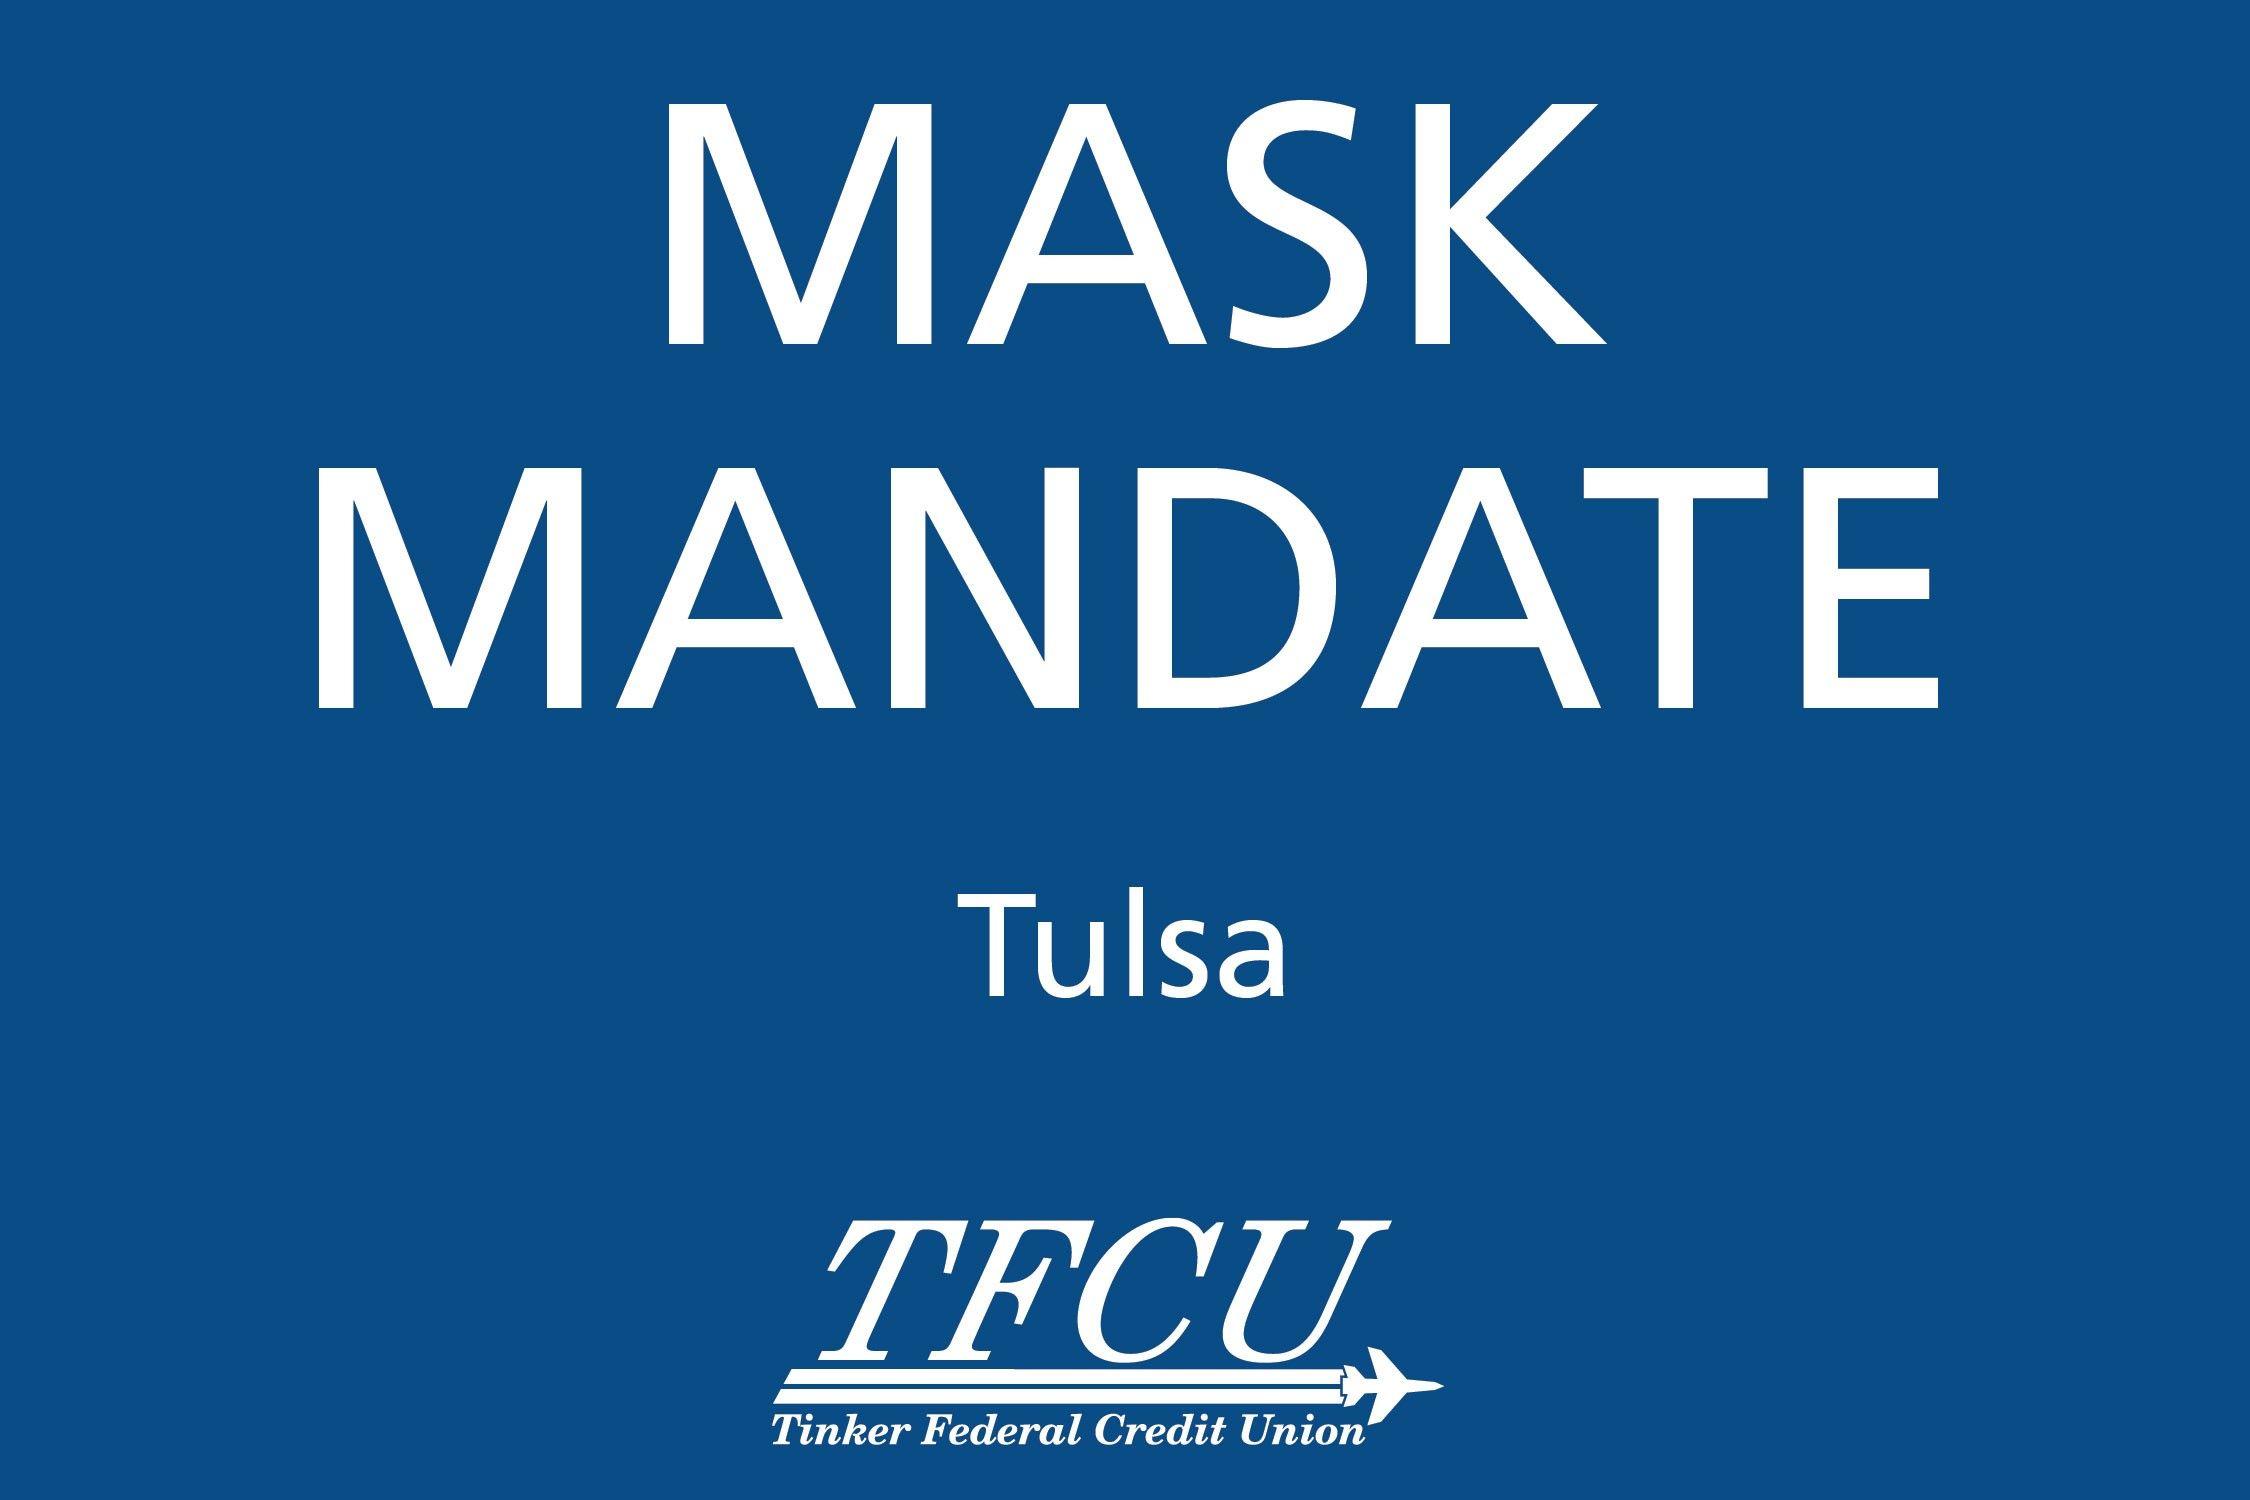 Tulsa Mask Mandate